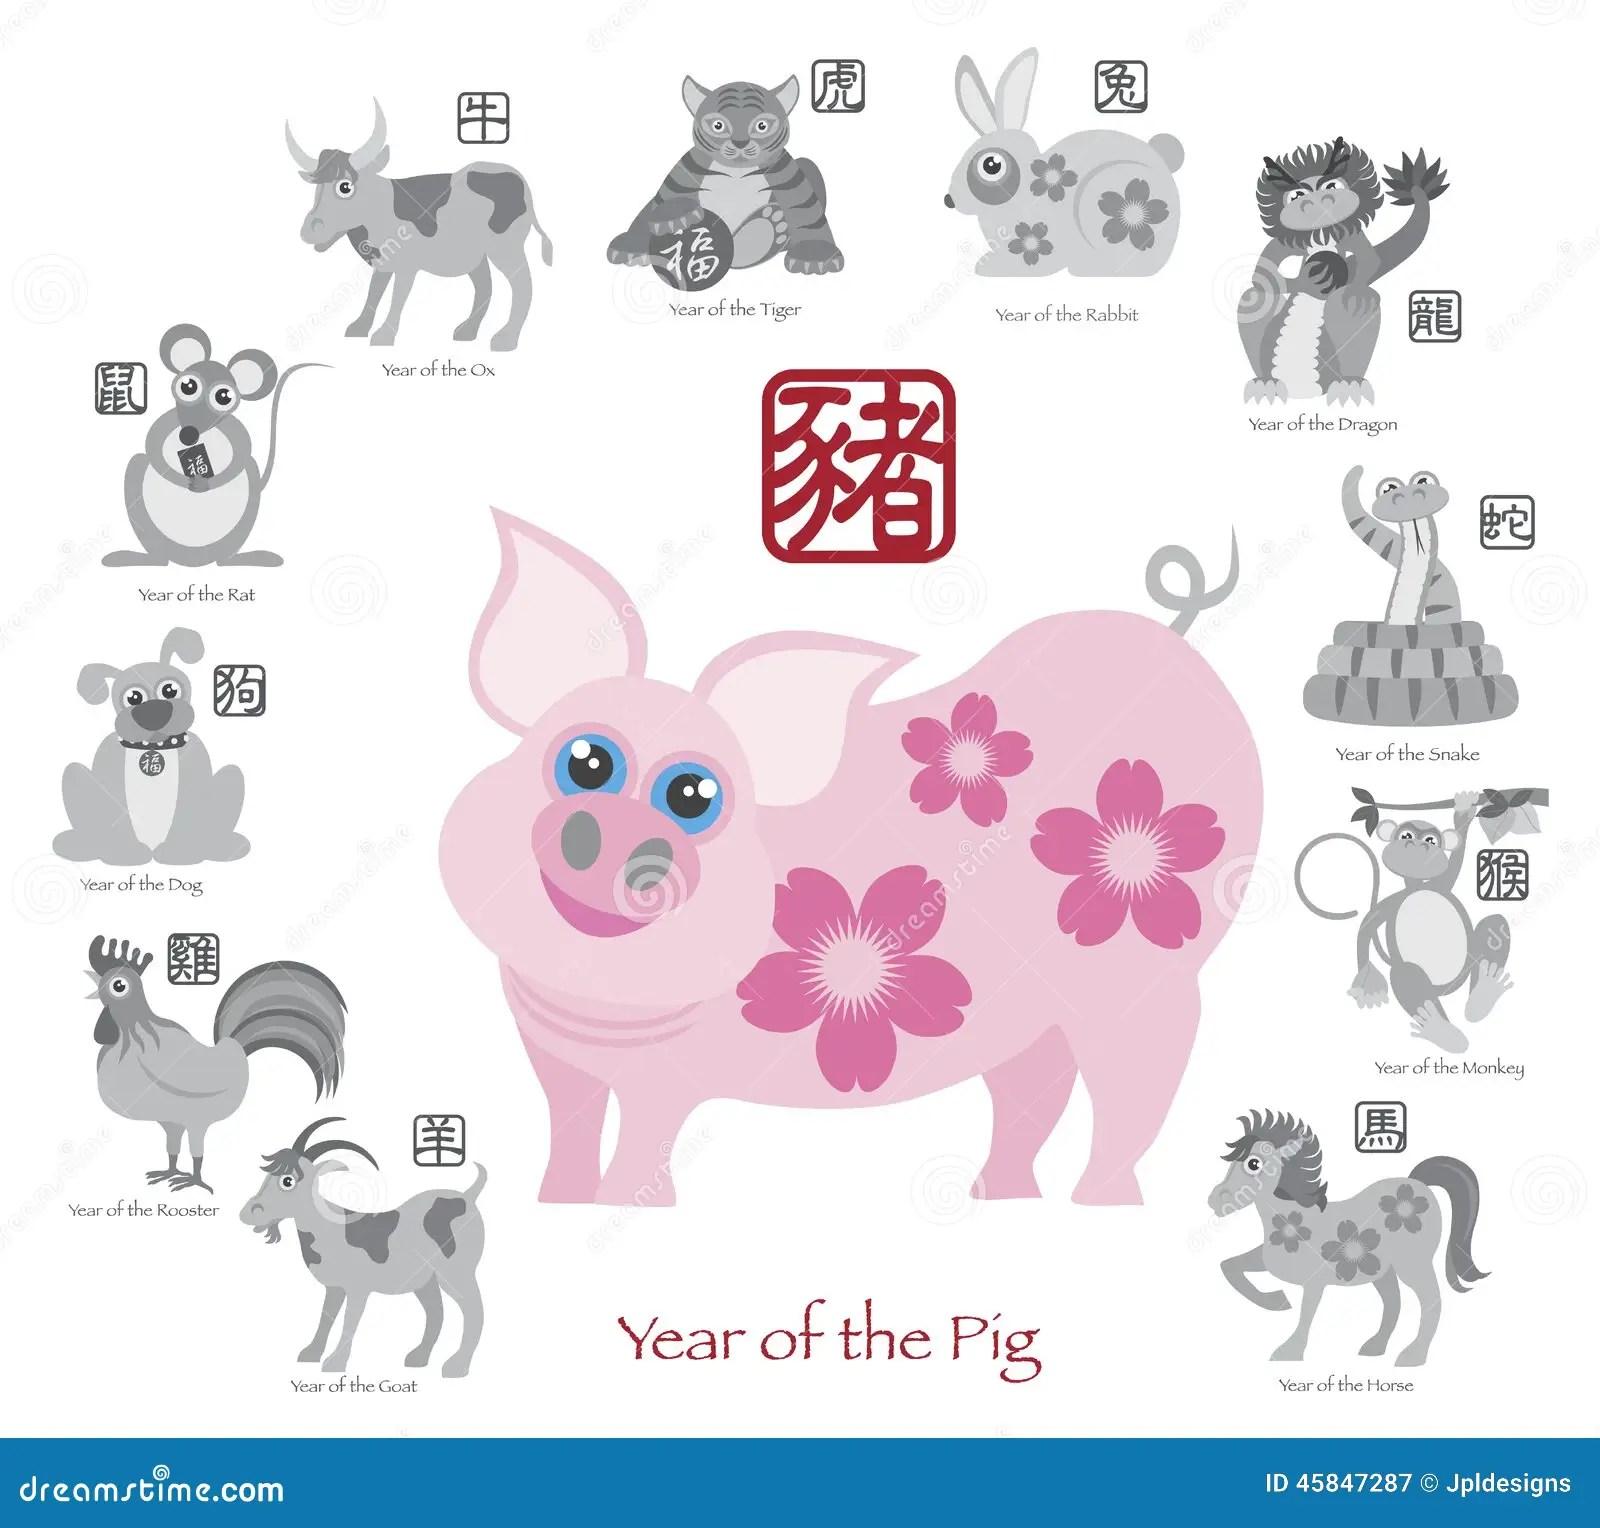 Chinese New Year Calendar Rabbit Chinese Zodiac Rabbit Personality Traits Year Of The Rabbit Chinese New Year Pig Color With Twelve Zodiacs Vector